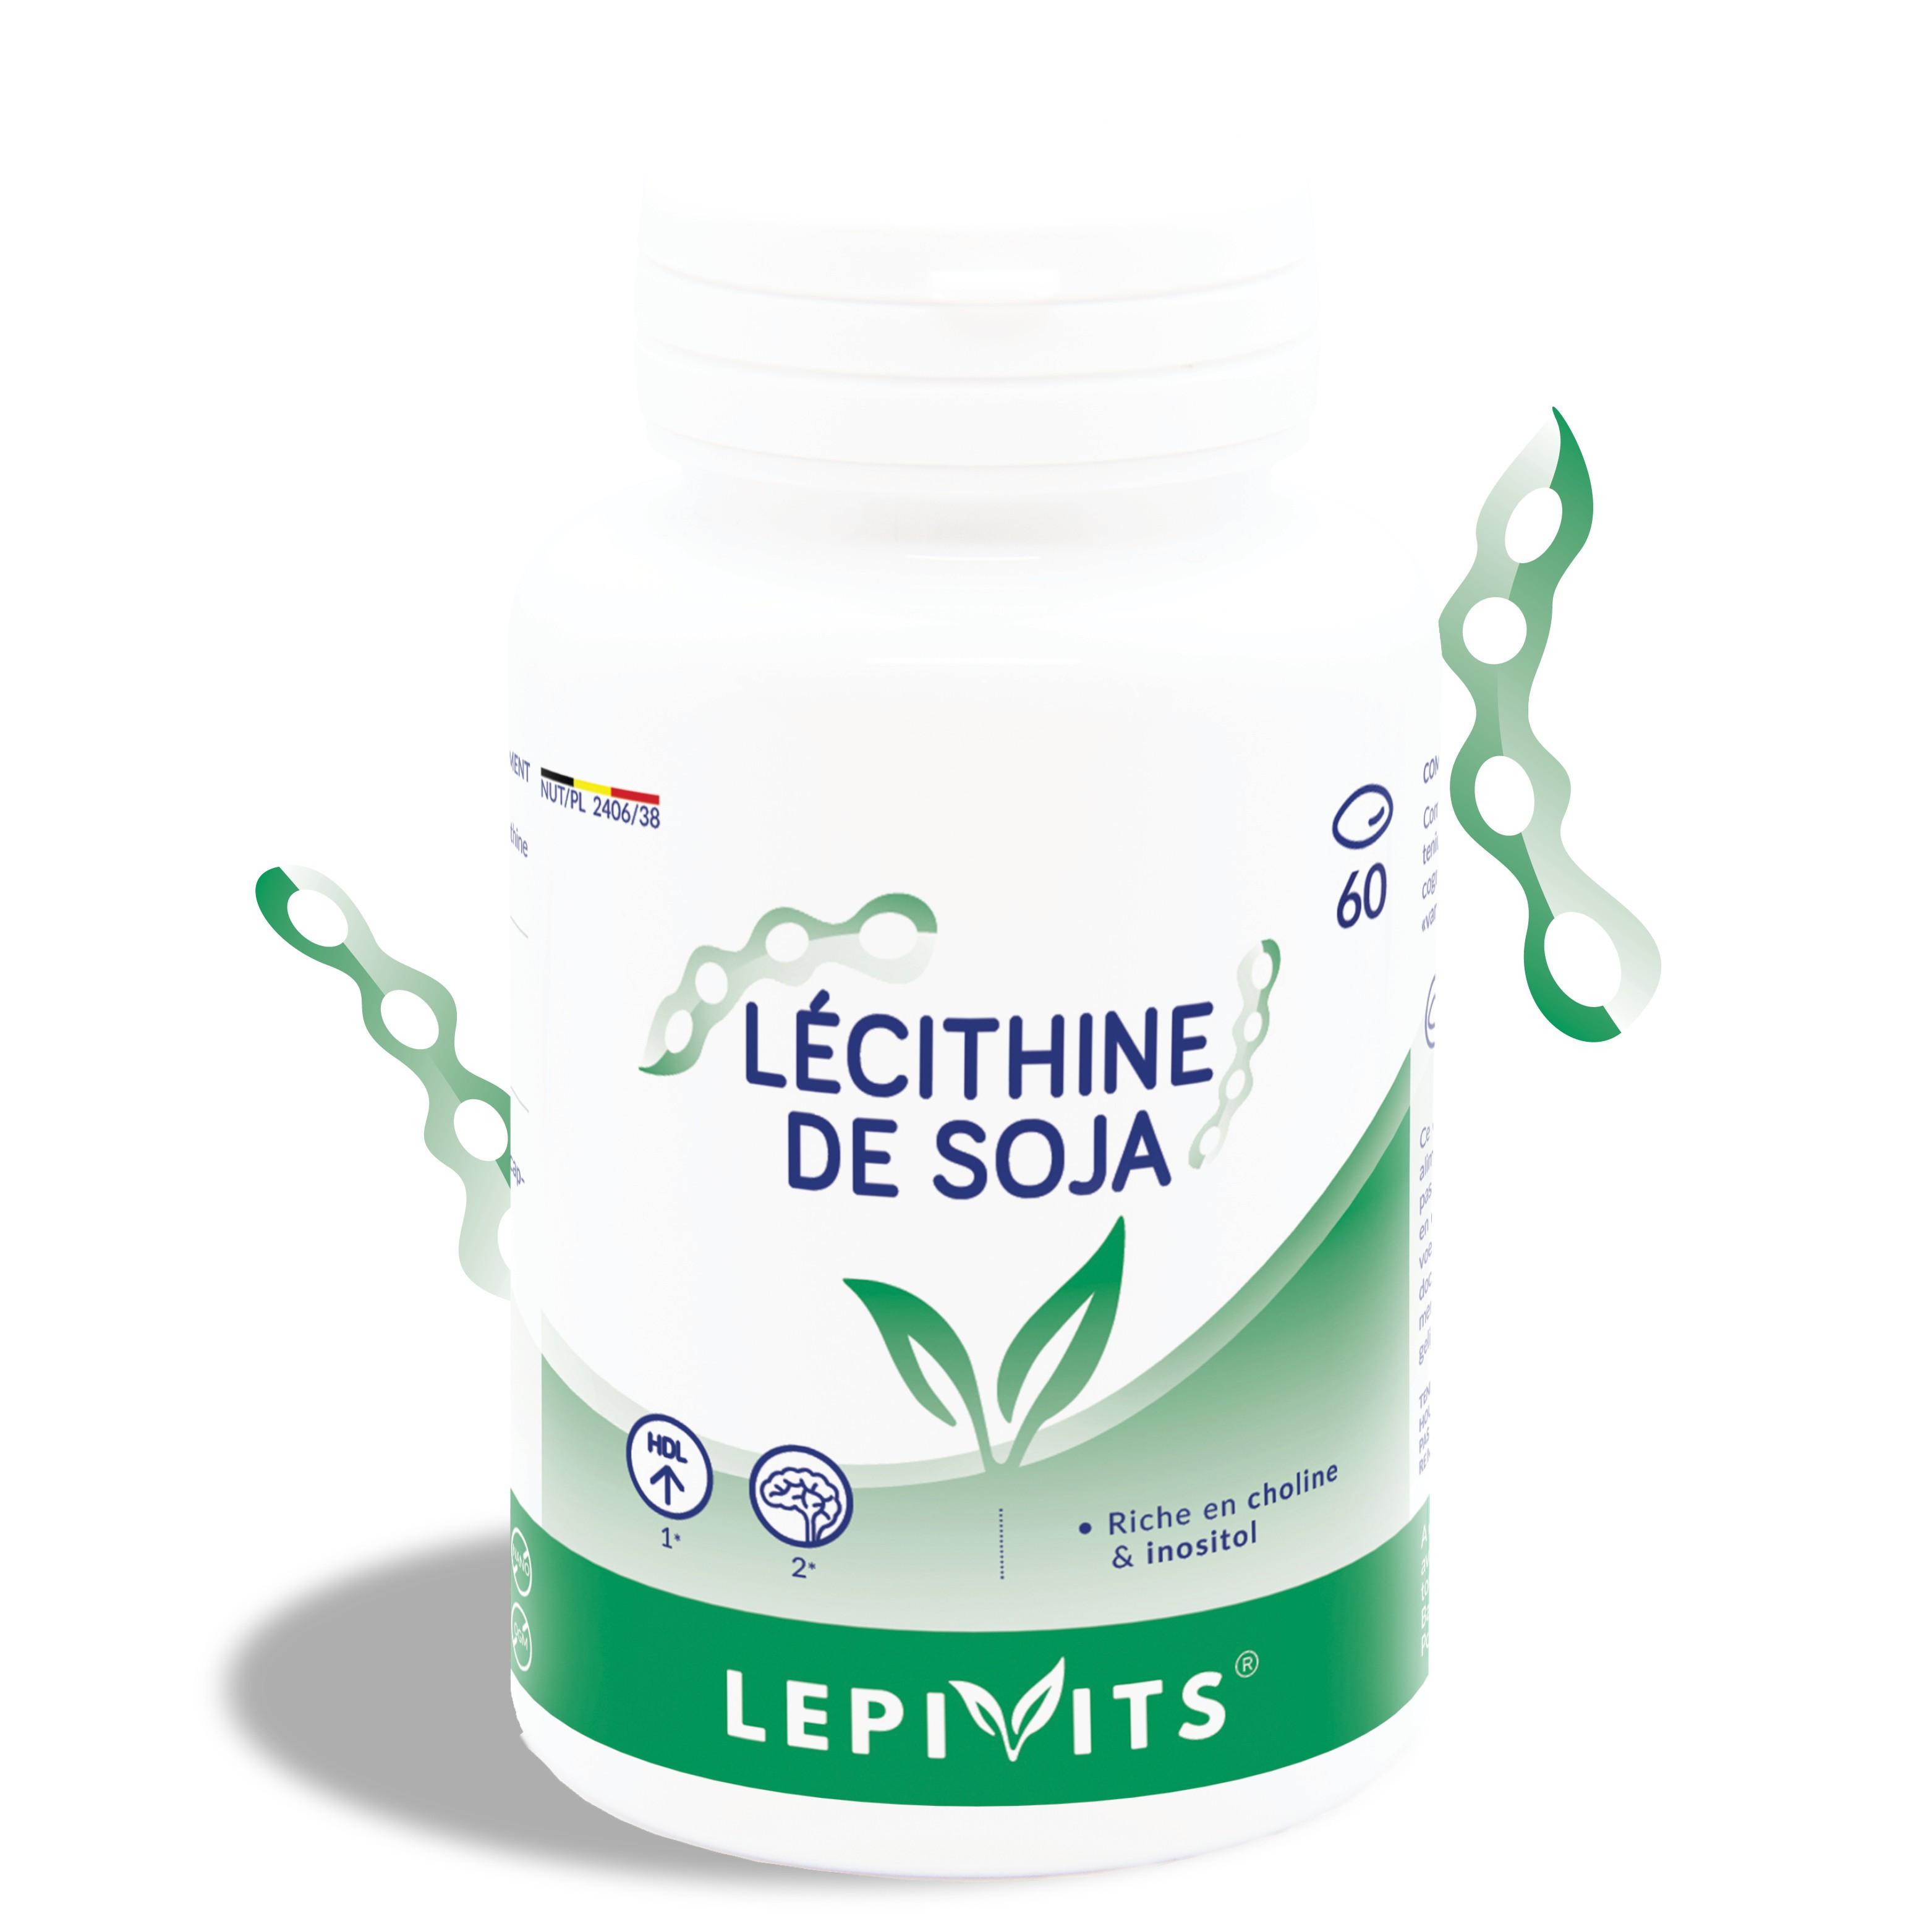 Lécithine de soja_60 capsules-LEPIVITS